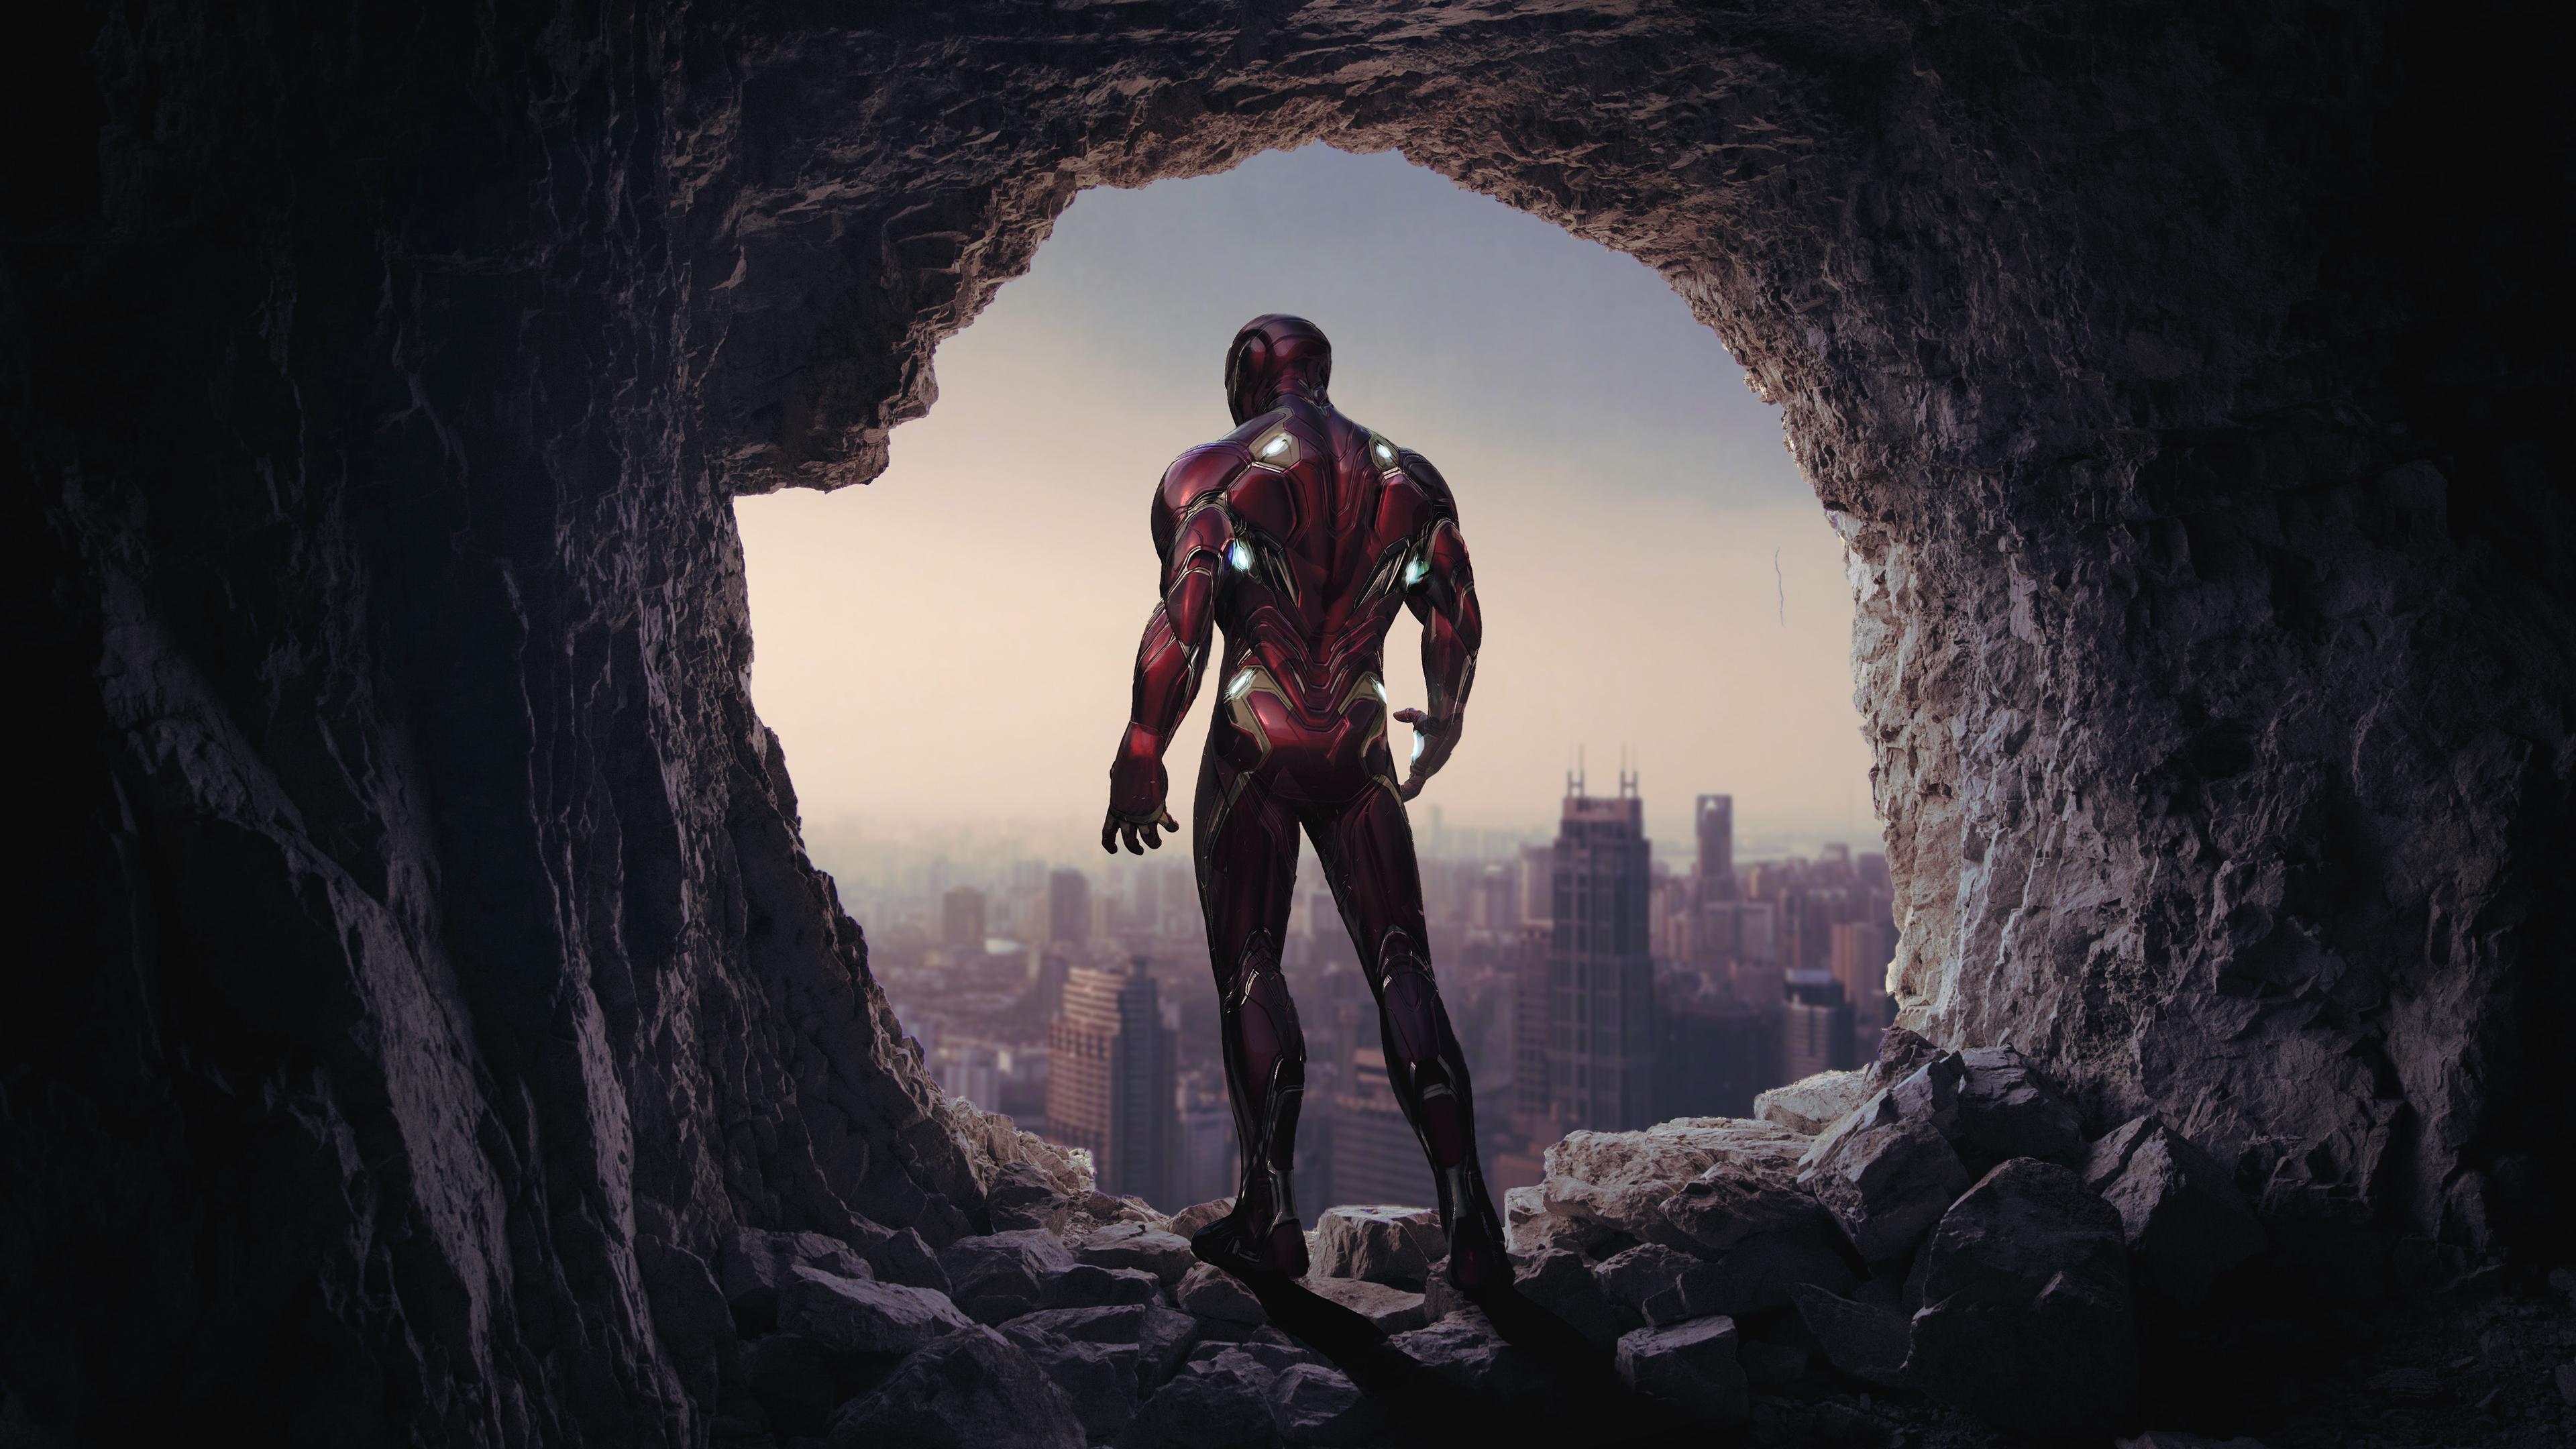 Iron Man Avengers Endgame 4k 2019 Iron Man Wallpaper 4k 3840x2160 Wallpaper Teahub Io